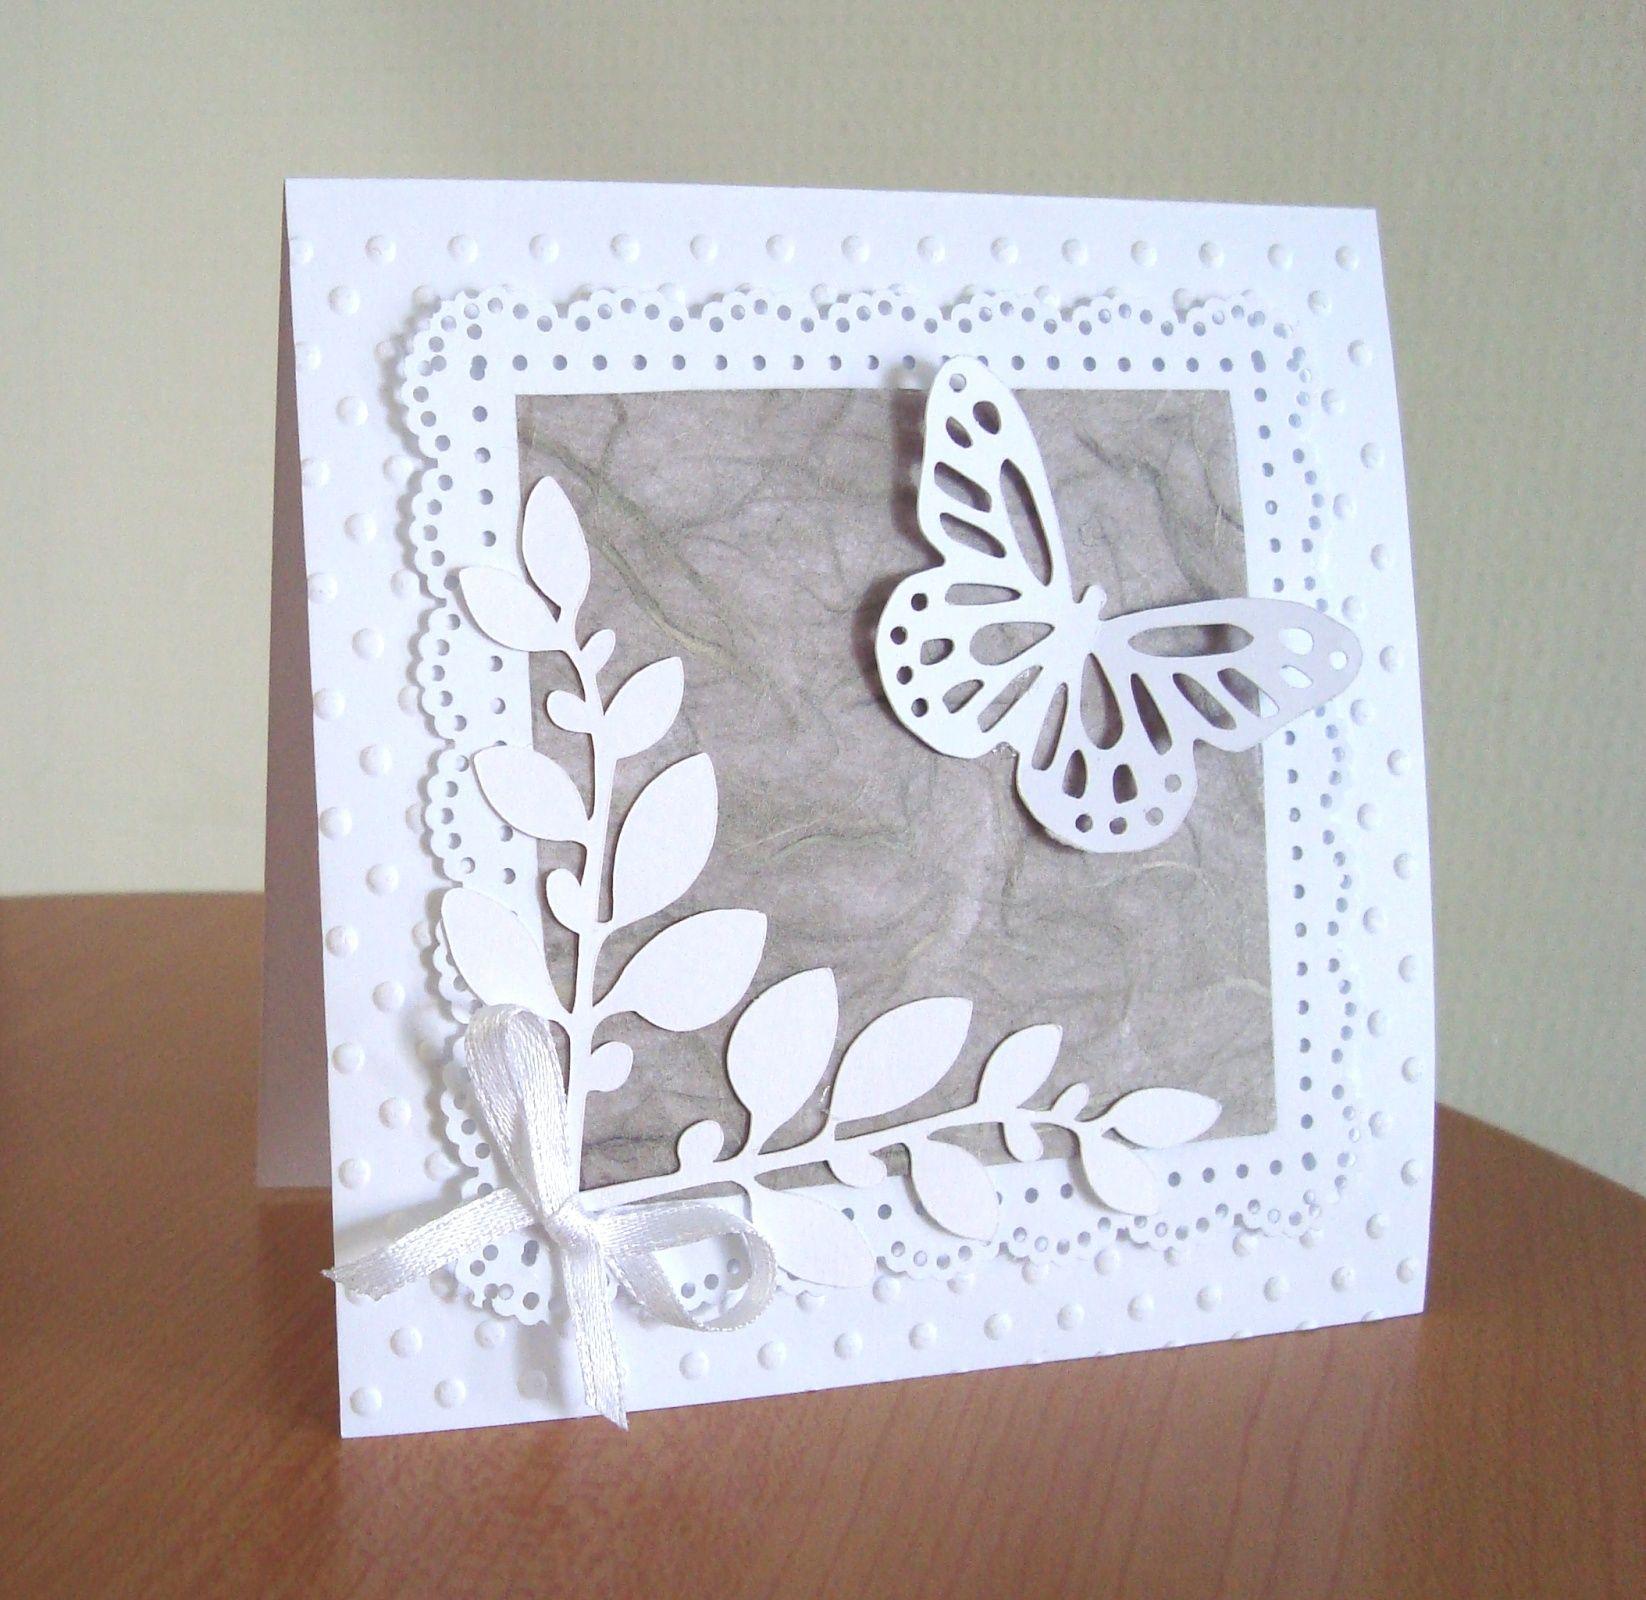 big shot et mini album de novembre le beau repaire du scrap deco carte mariage. Black Bedroom Furniture Sets. Home Design Ideas